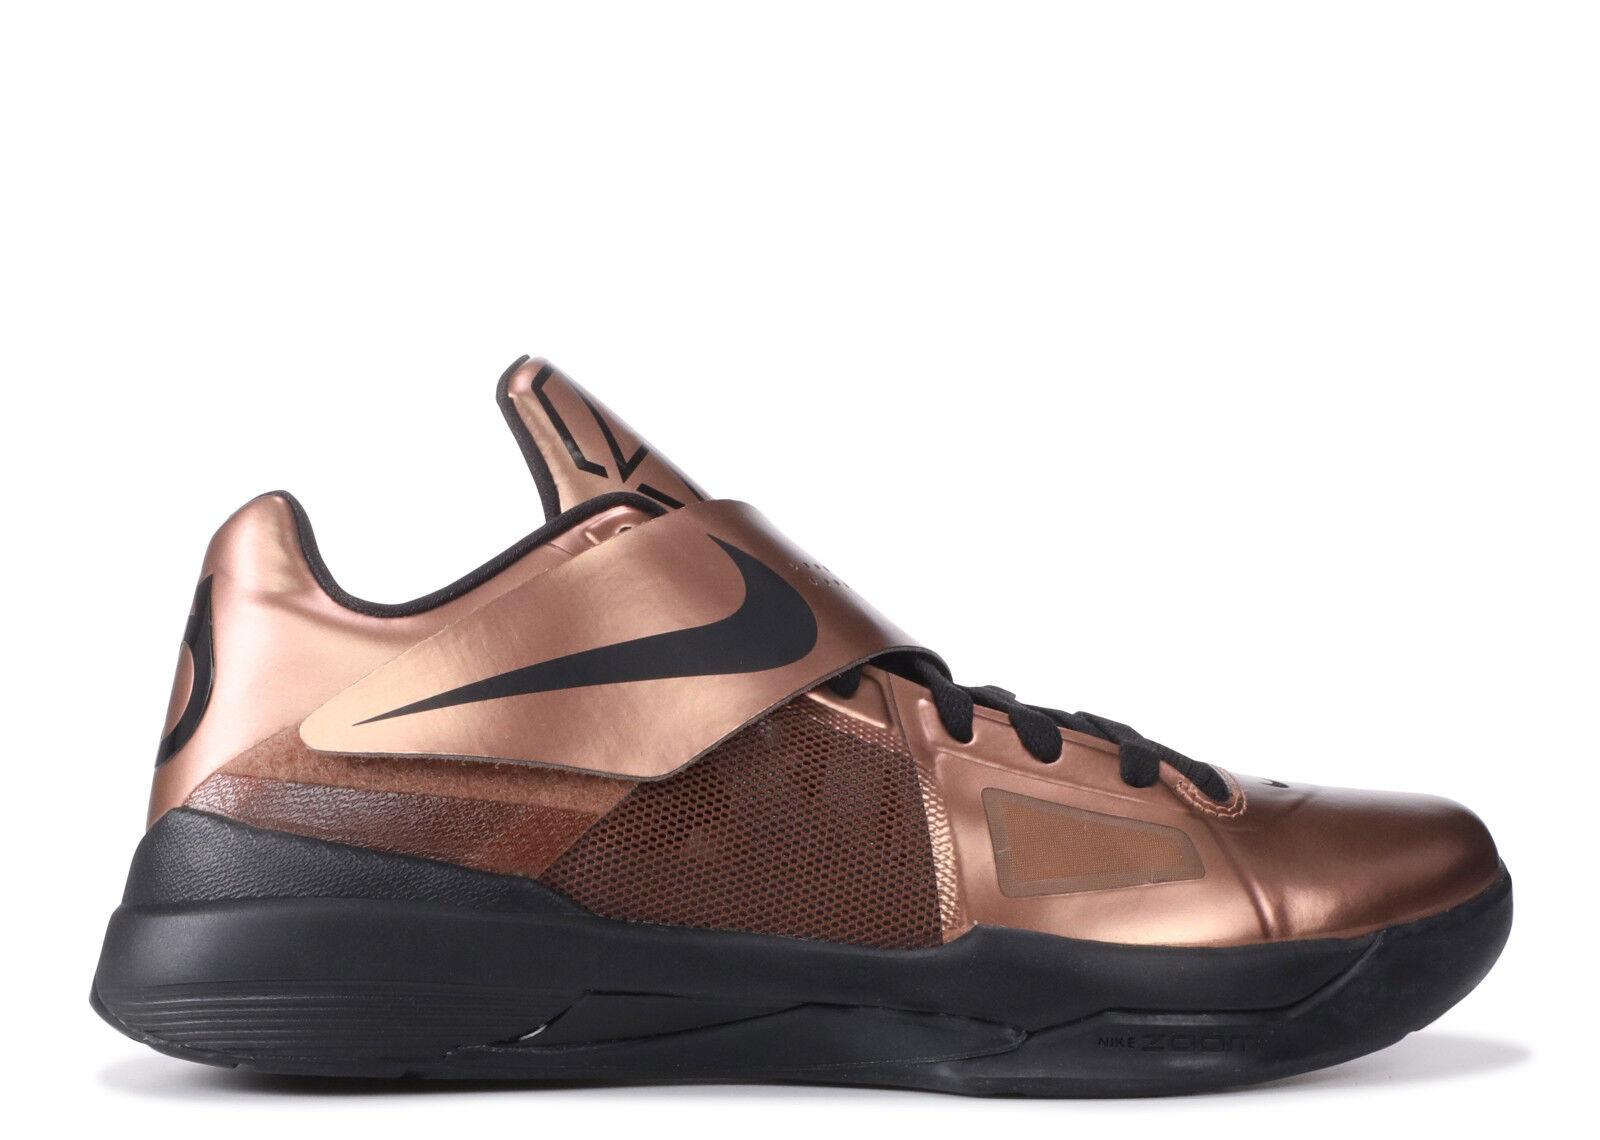 2011 Nike Zoom KD 4 IV Christmas Size 13. 473679-700 jordan kobe